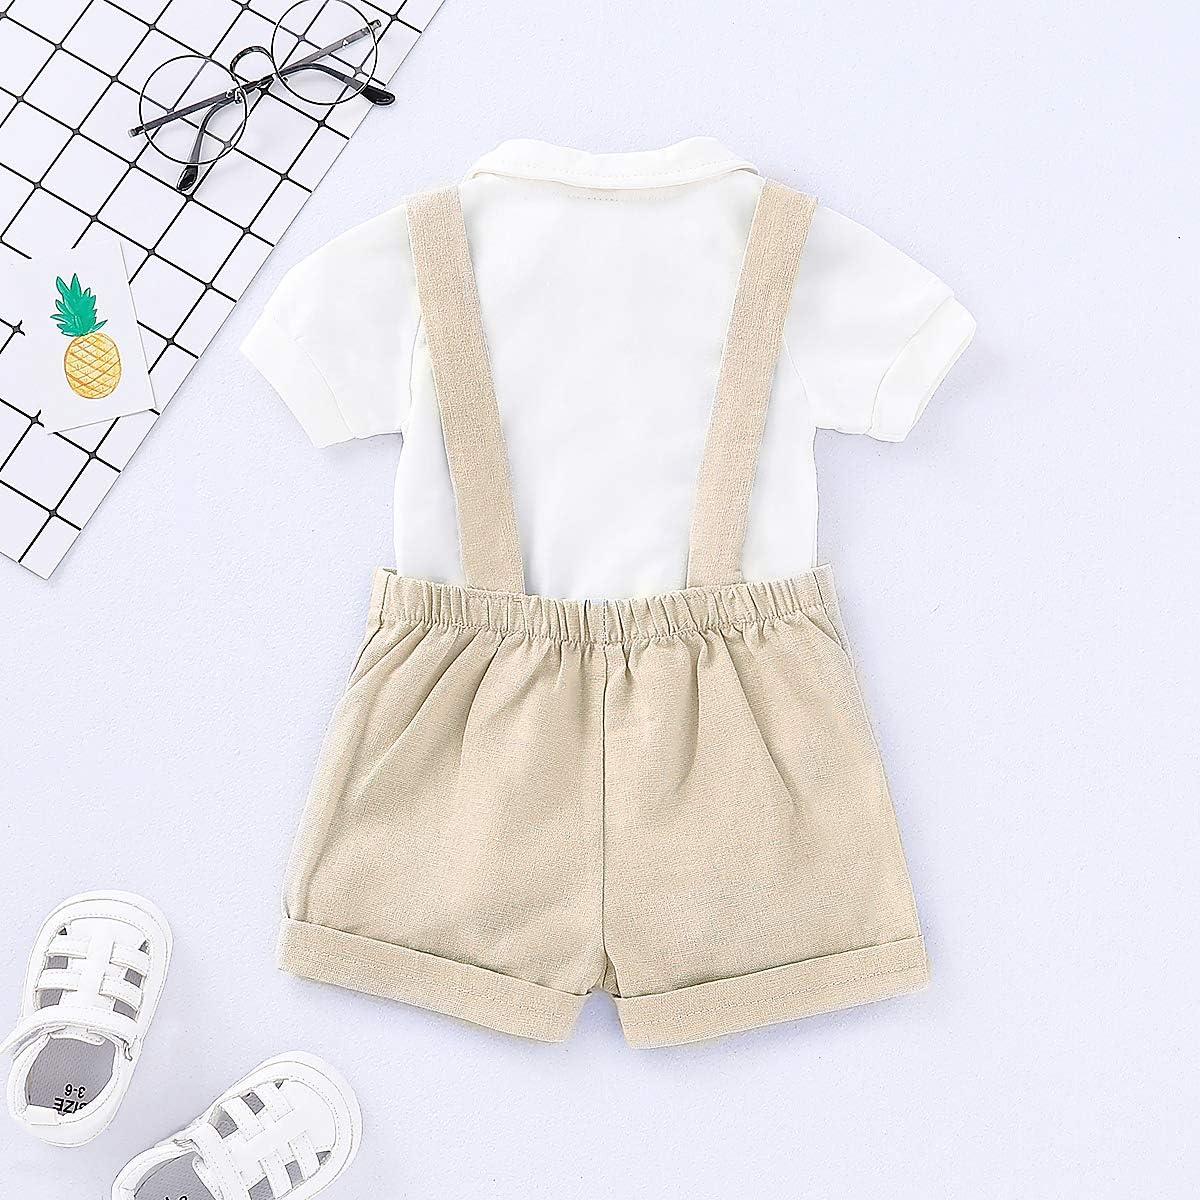 Shorts Bretelle 0-24 Mesi Borlai 2 Pezzi//Set Baby Boy Gentlemen Suit Pagliaccetto Moda